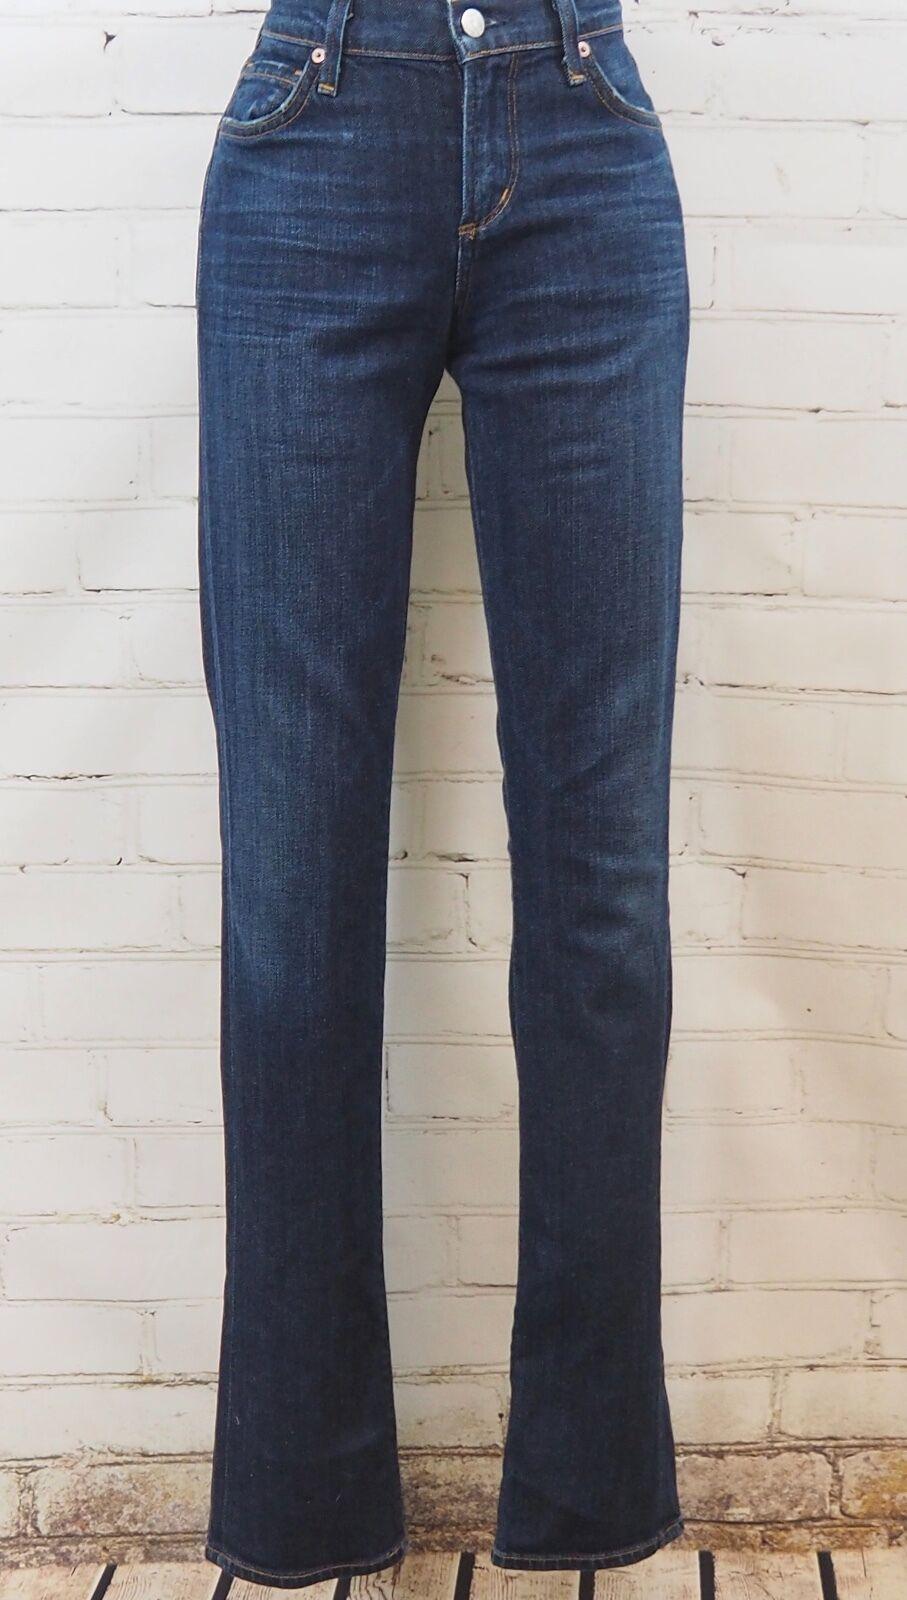 Citizen's of Humanity Elson Jeans Medium Rise Straight Leg Dark Rinse Size 25